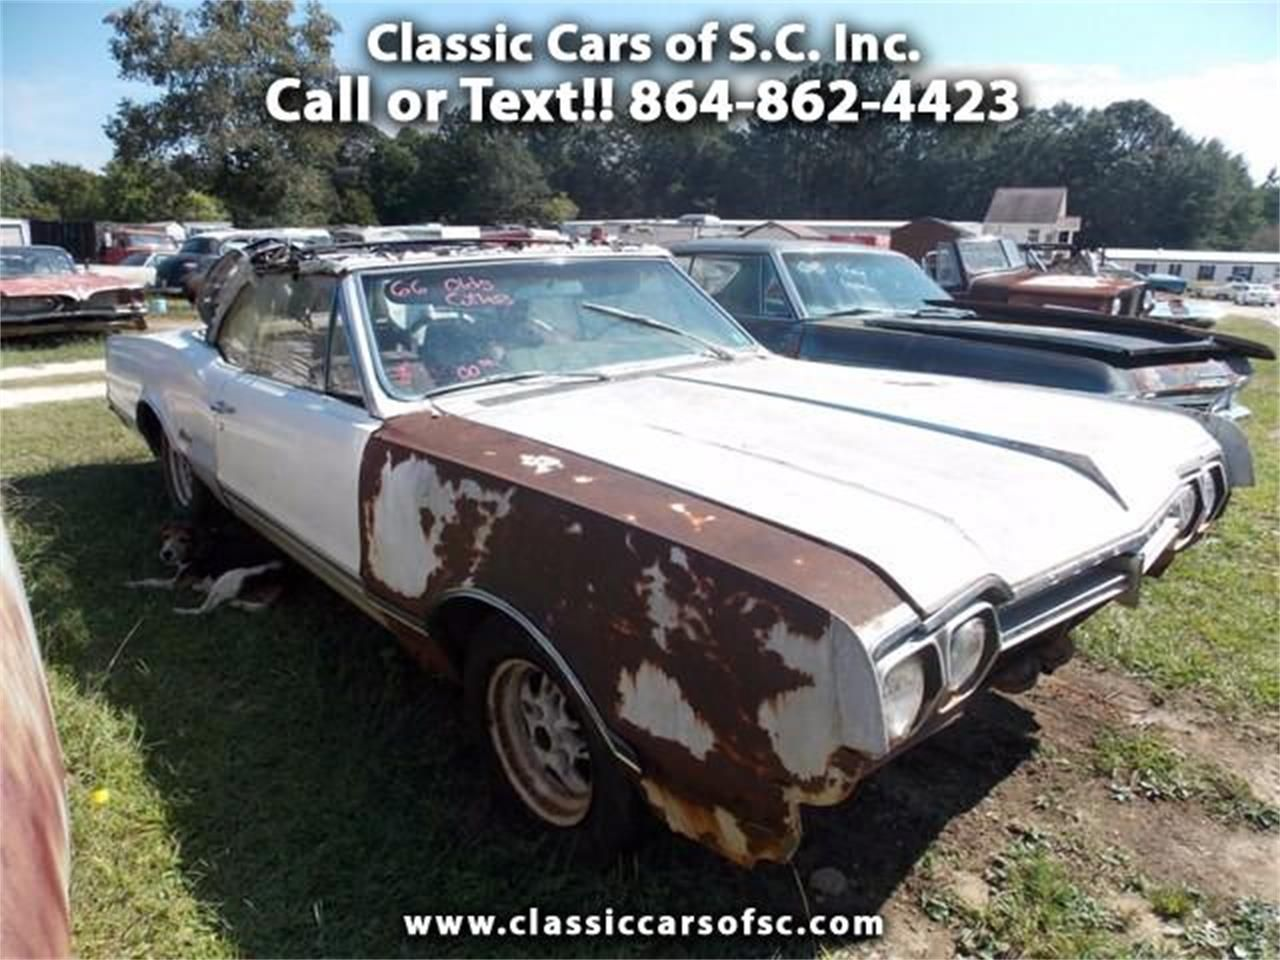 1966 Oldsmobile Cutlass   oldsmobile   Pinterest   Oldsmobile cutlass